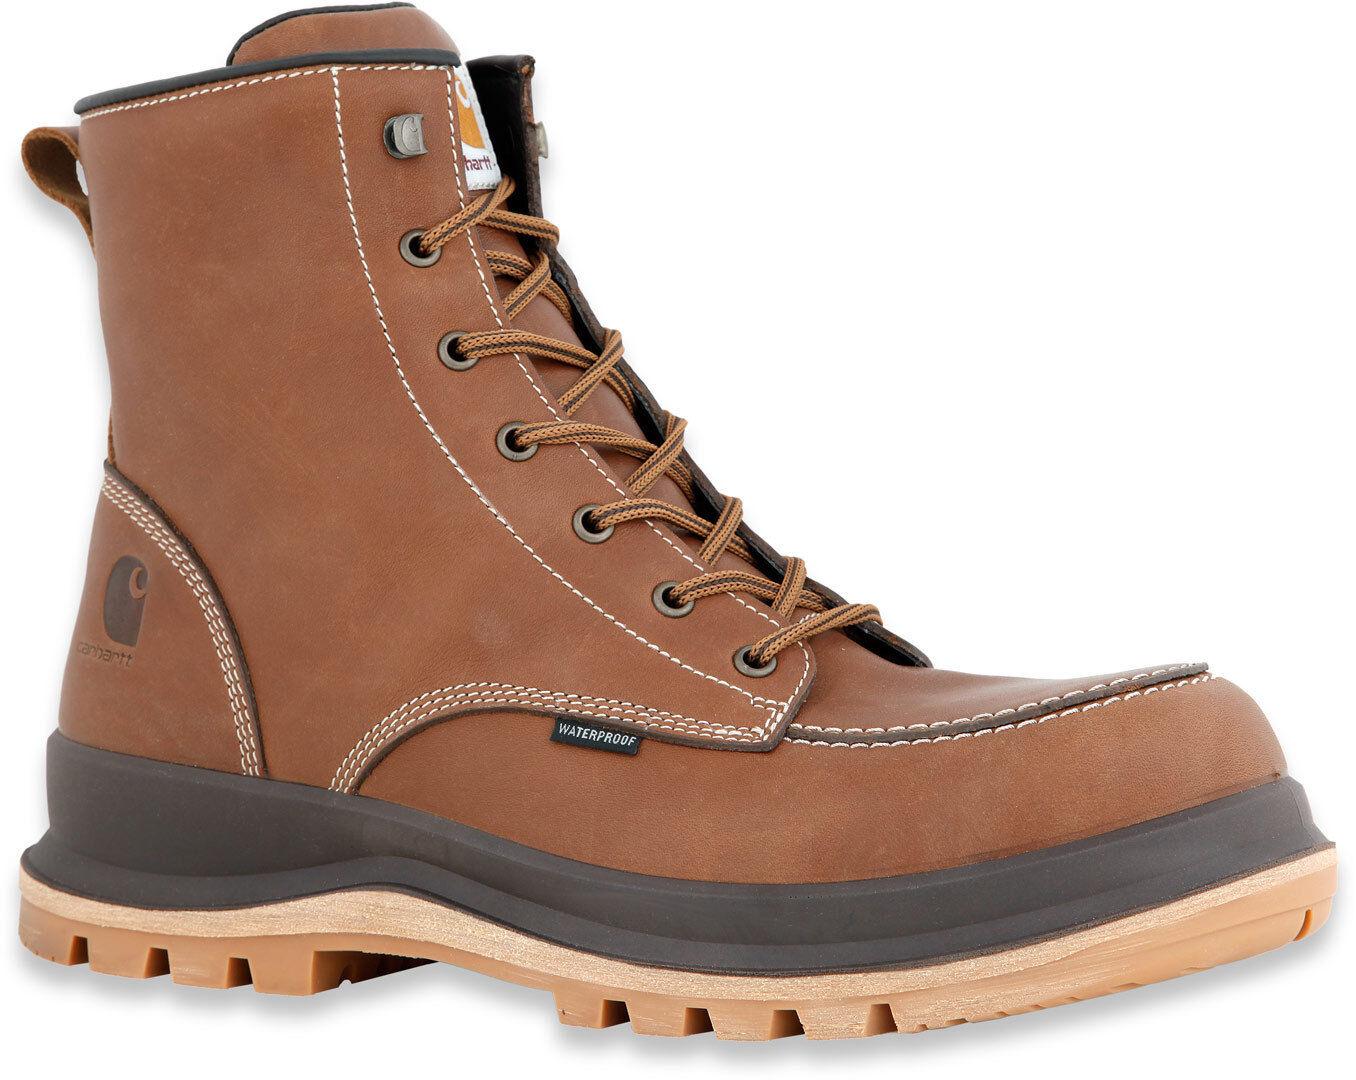 Carhartt Hamilton Rugged Flex S3 Boots Brown 44